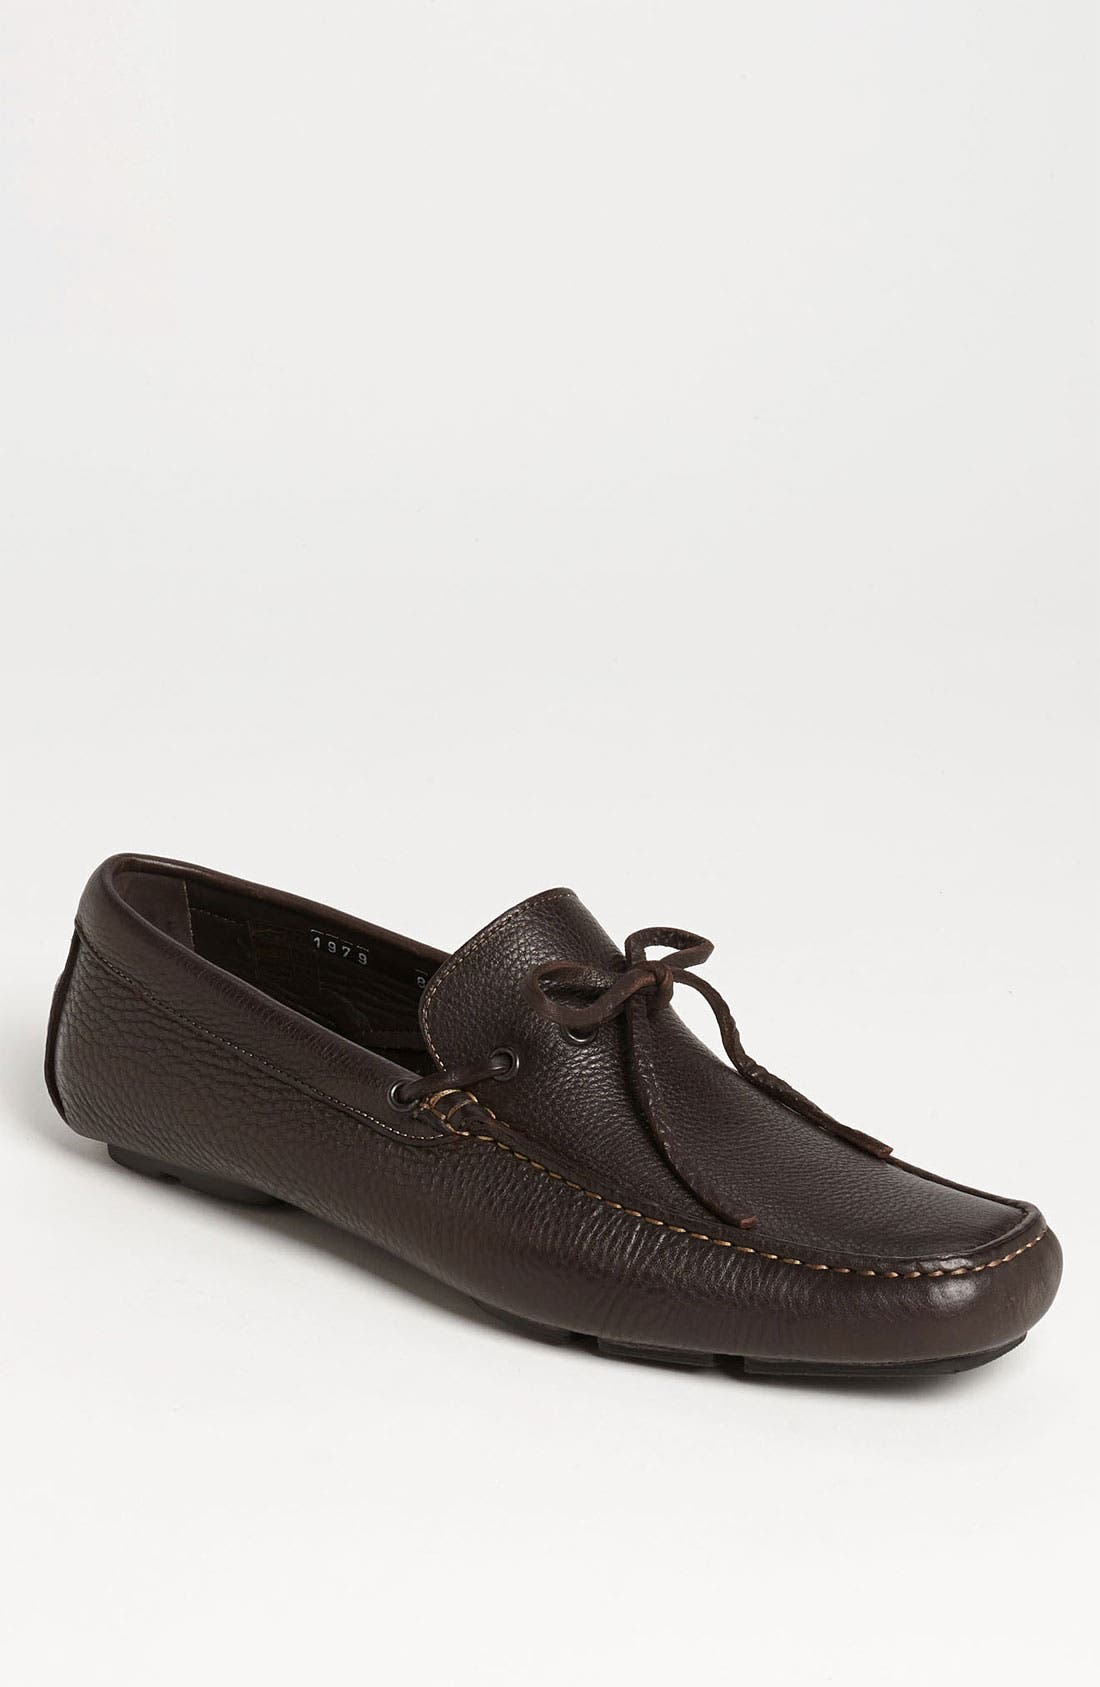 Main Image - To Boot New York 'Watson' Driving Shoe